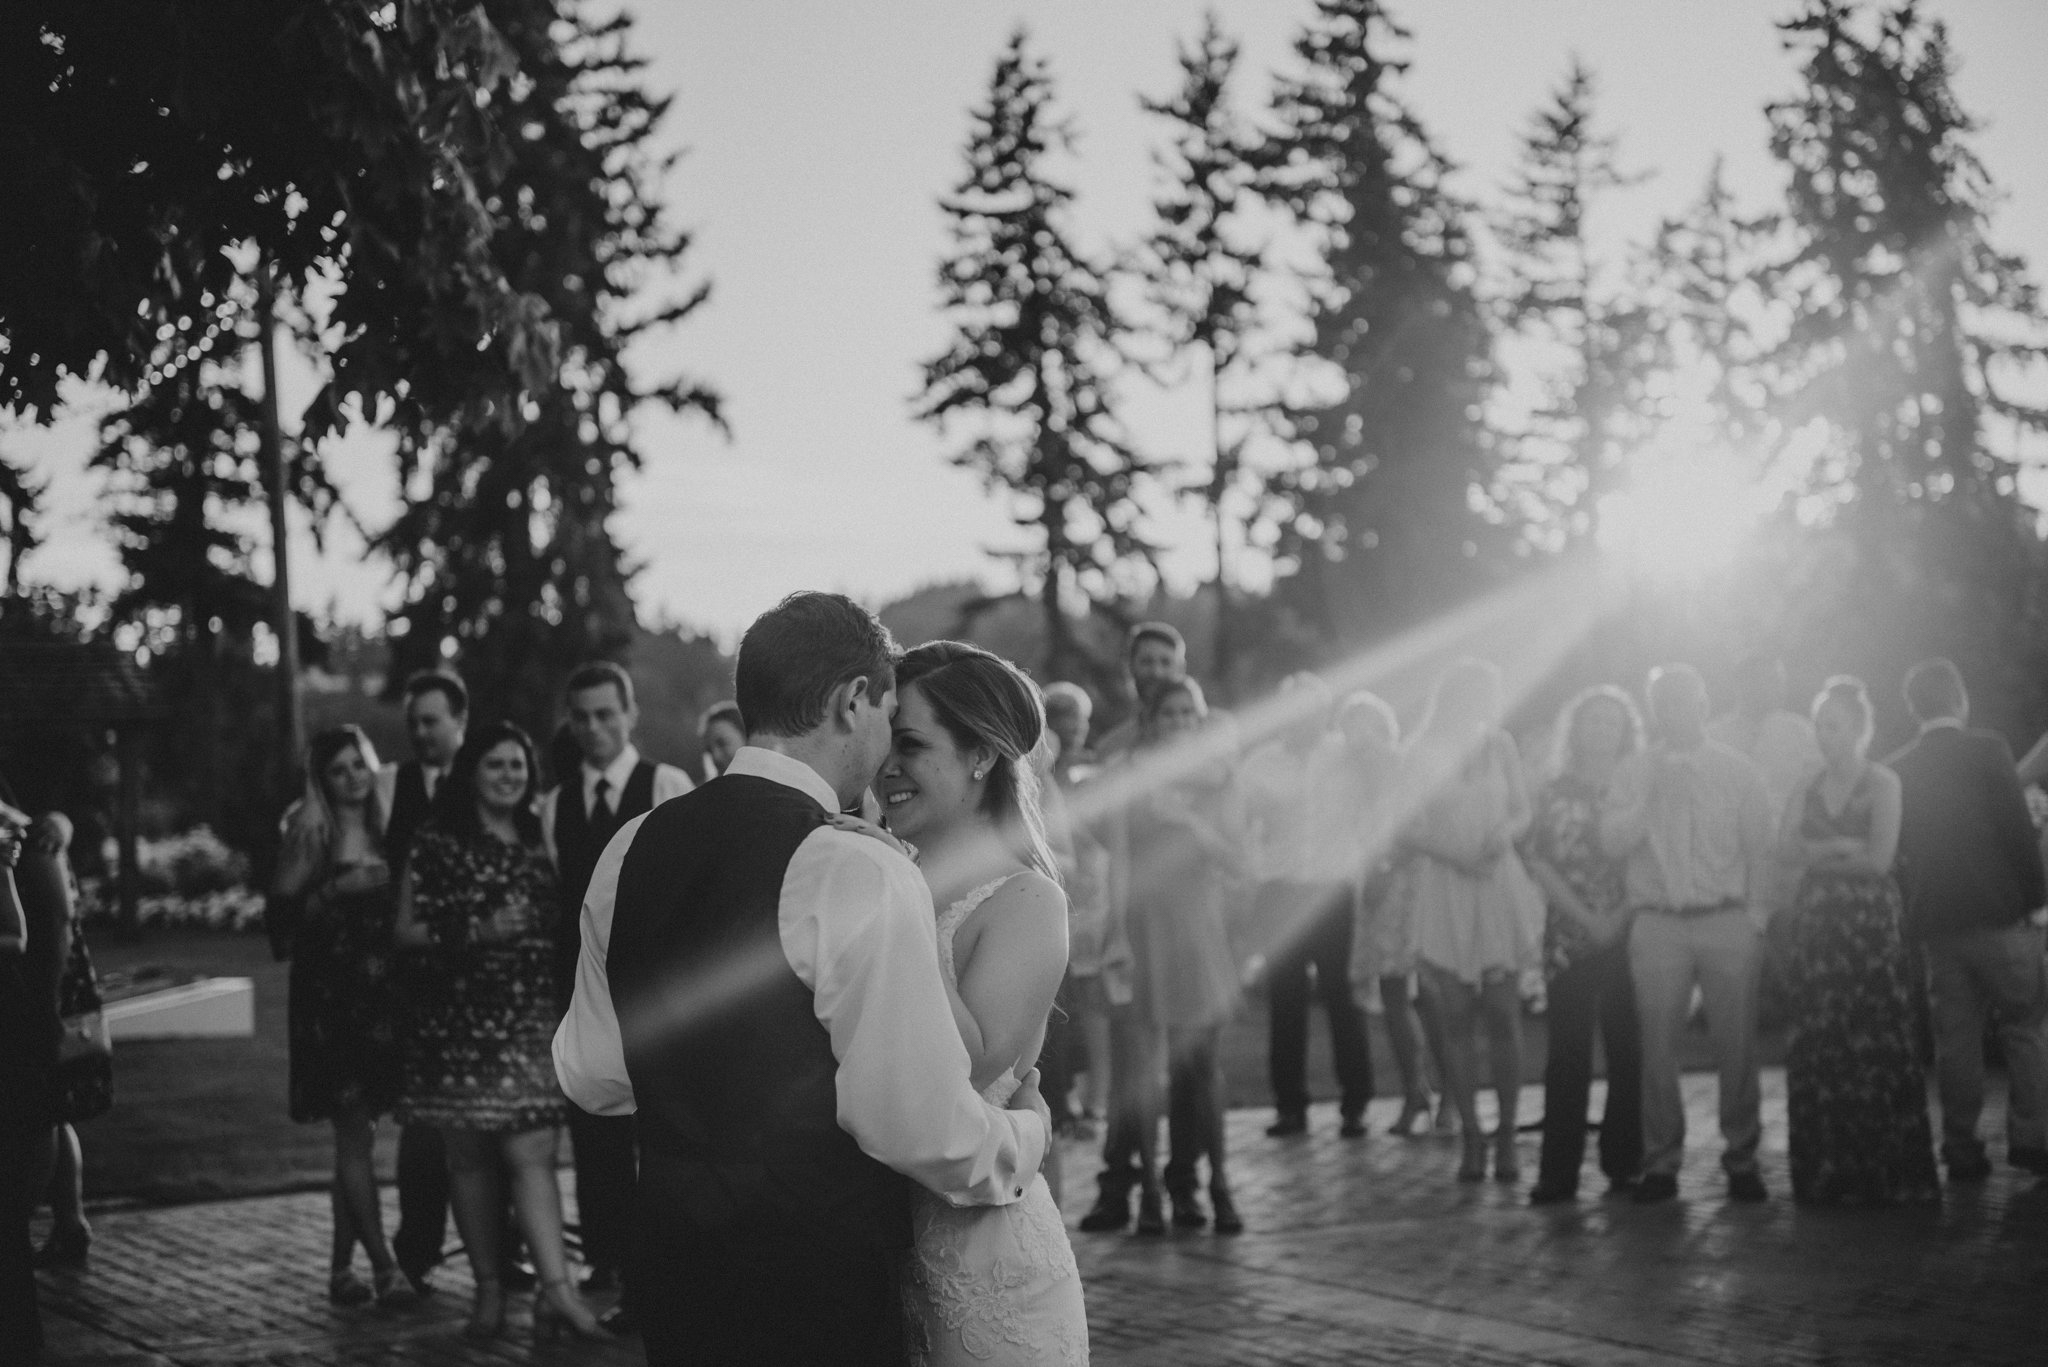 kristen-and-cody-the-kelley-farm-wedding-seattle-photographer-caitlyn-nikula-102.jpg